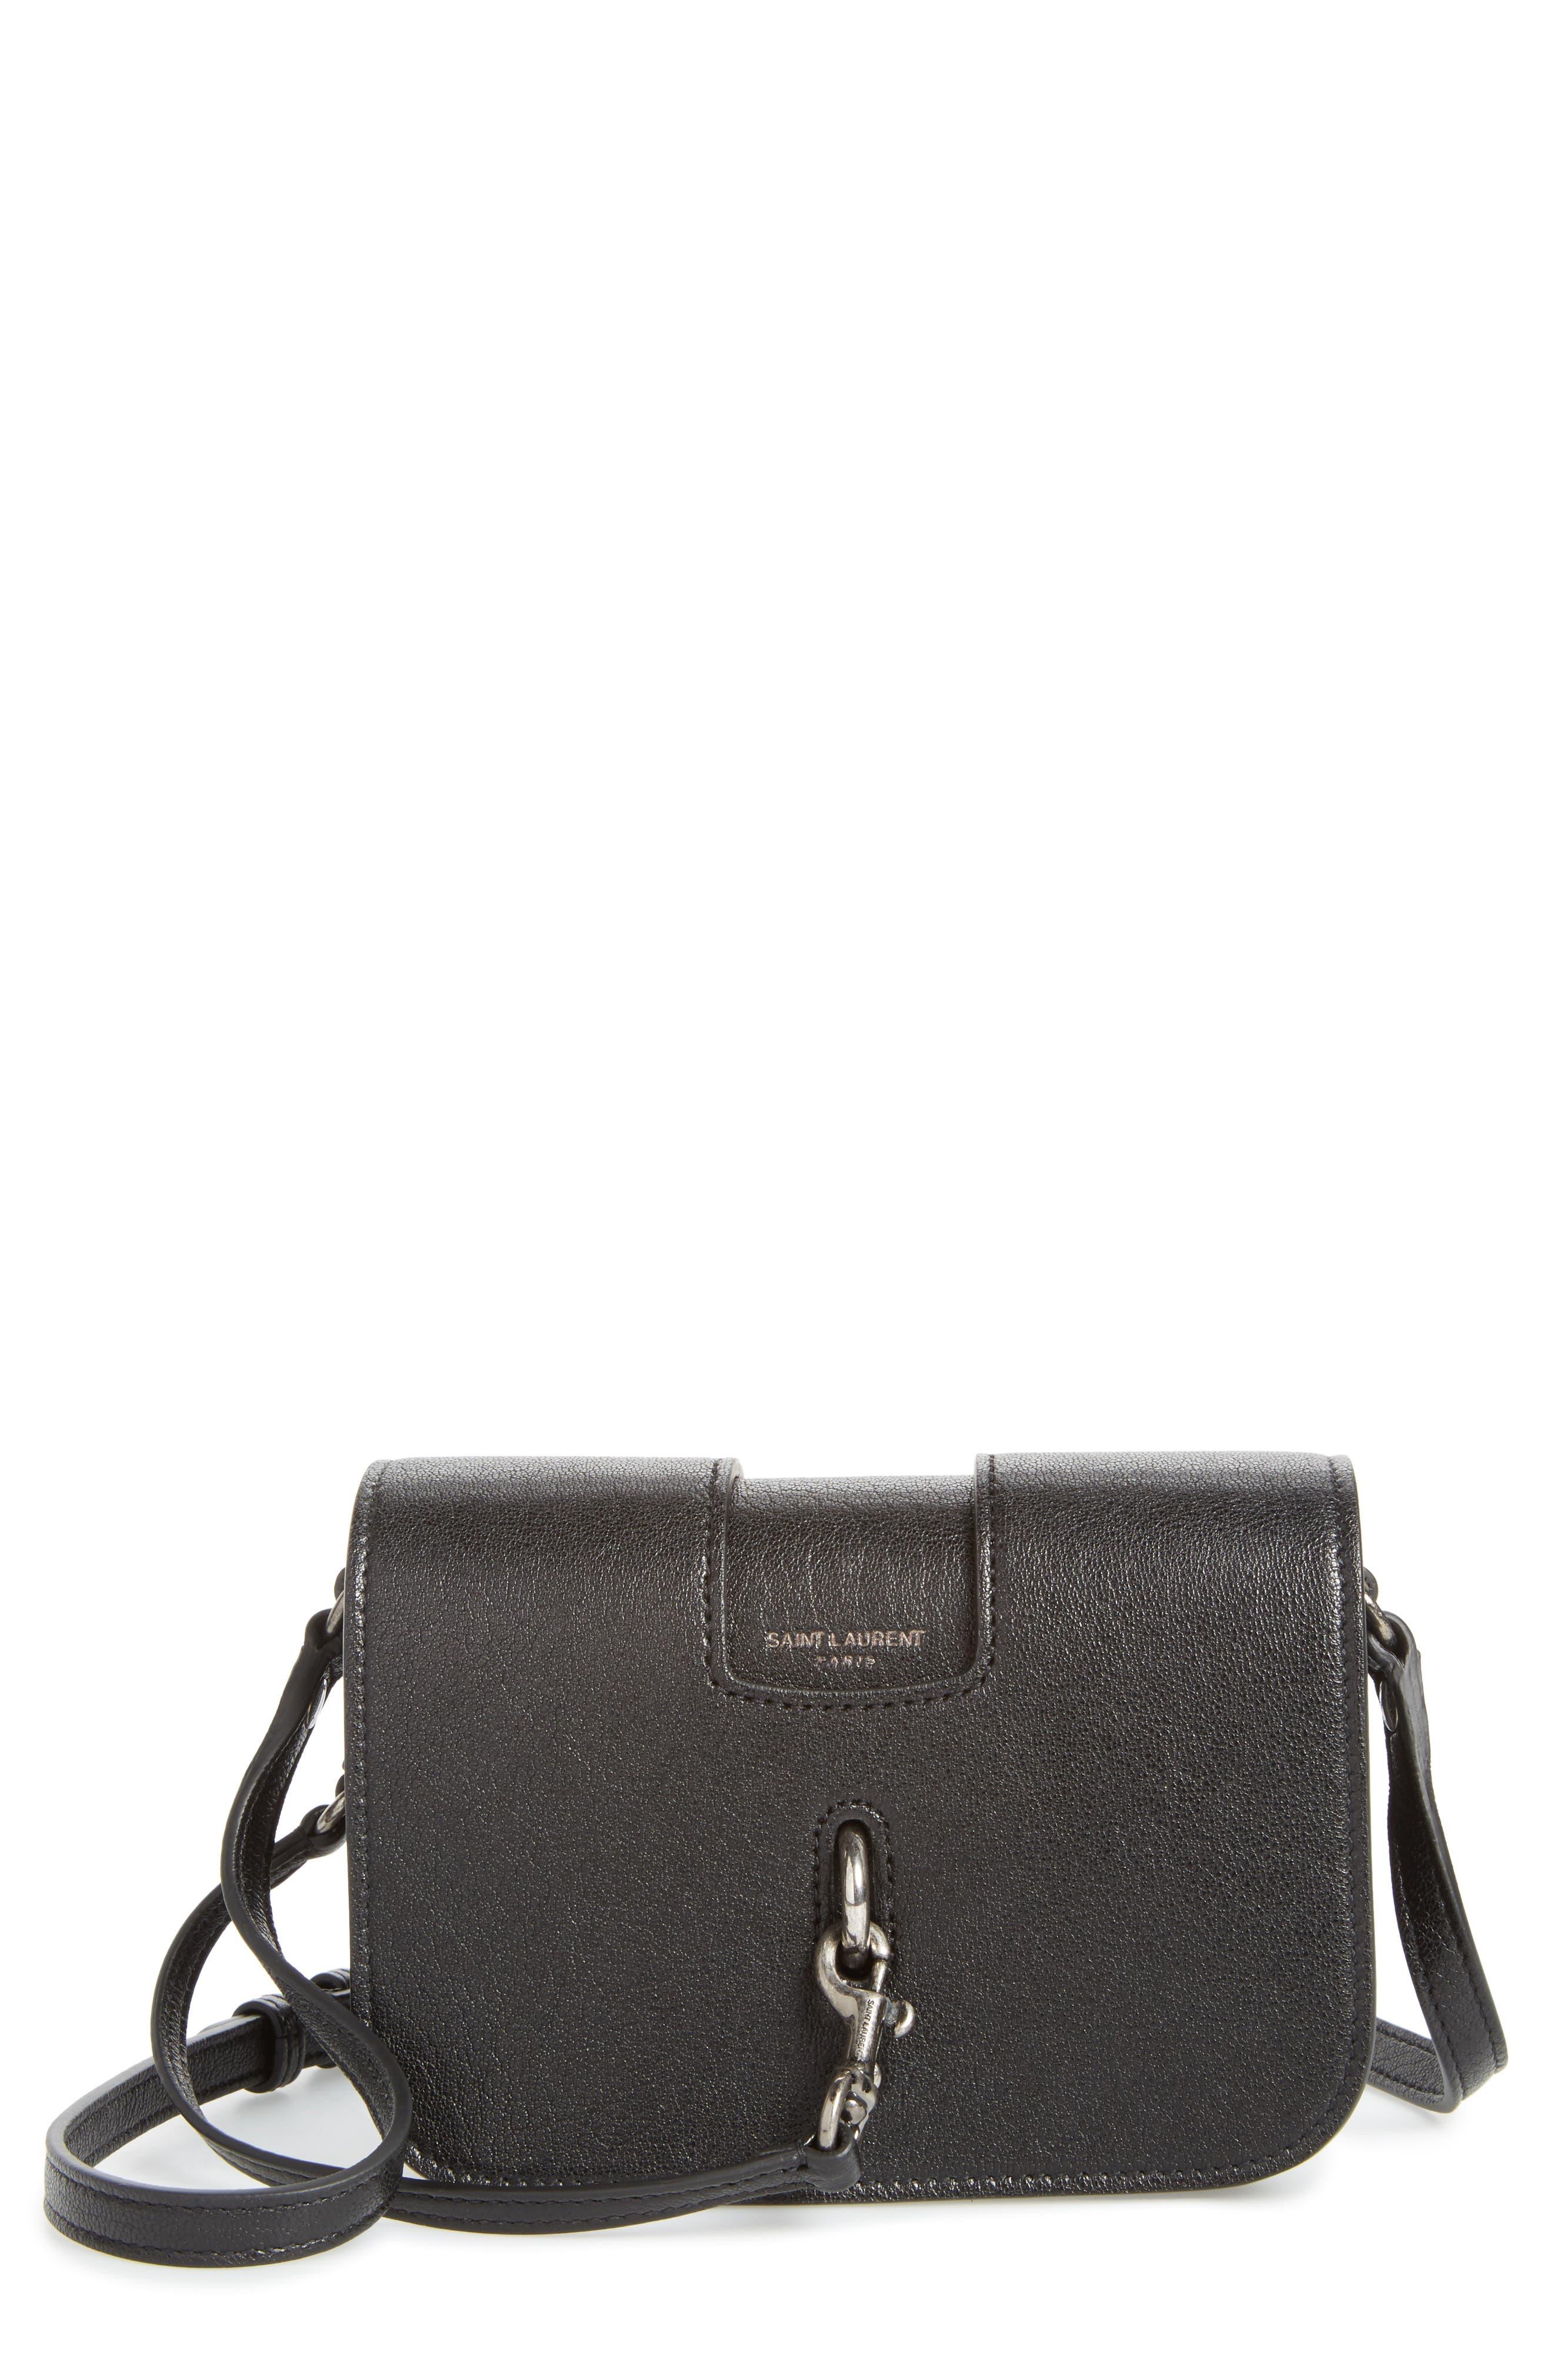 Calfskin Leather Crossbody Bag,                             Main thumbnail 1, color,                             001